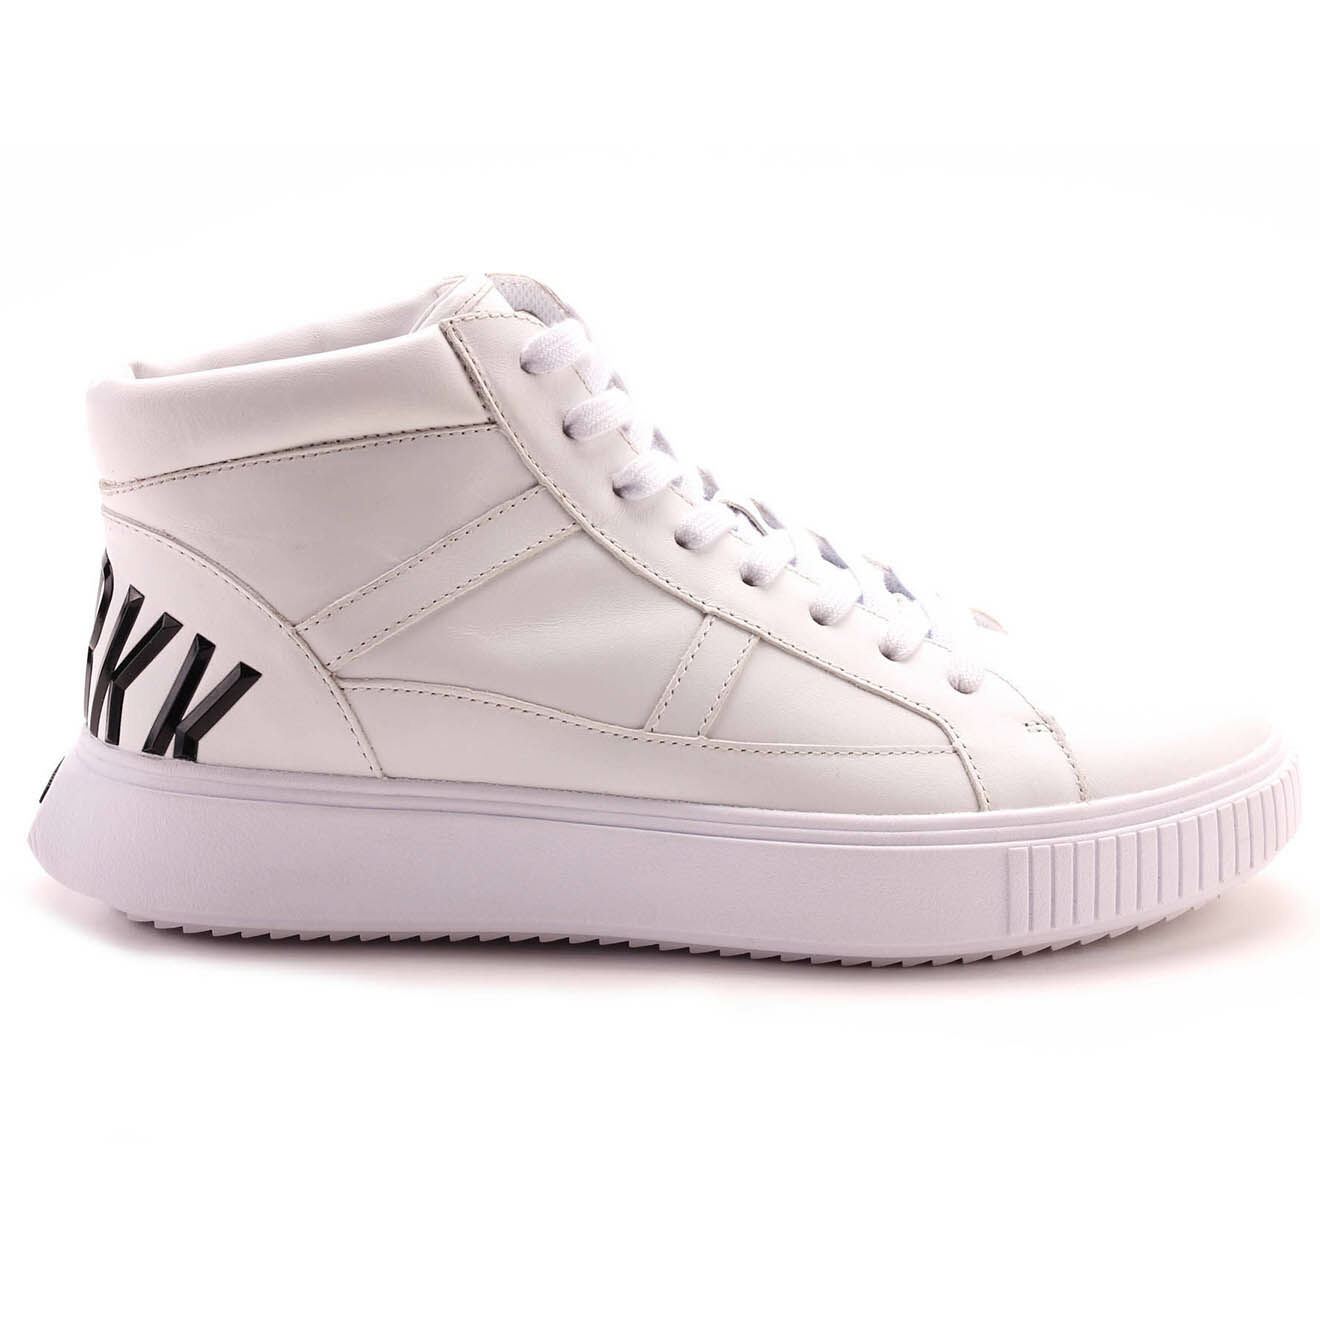 Sneakers montantes en Cuir Colbin blanches - Bikkembergs - Modalova